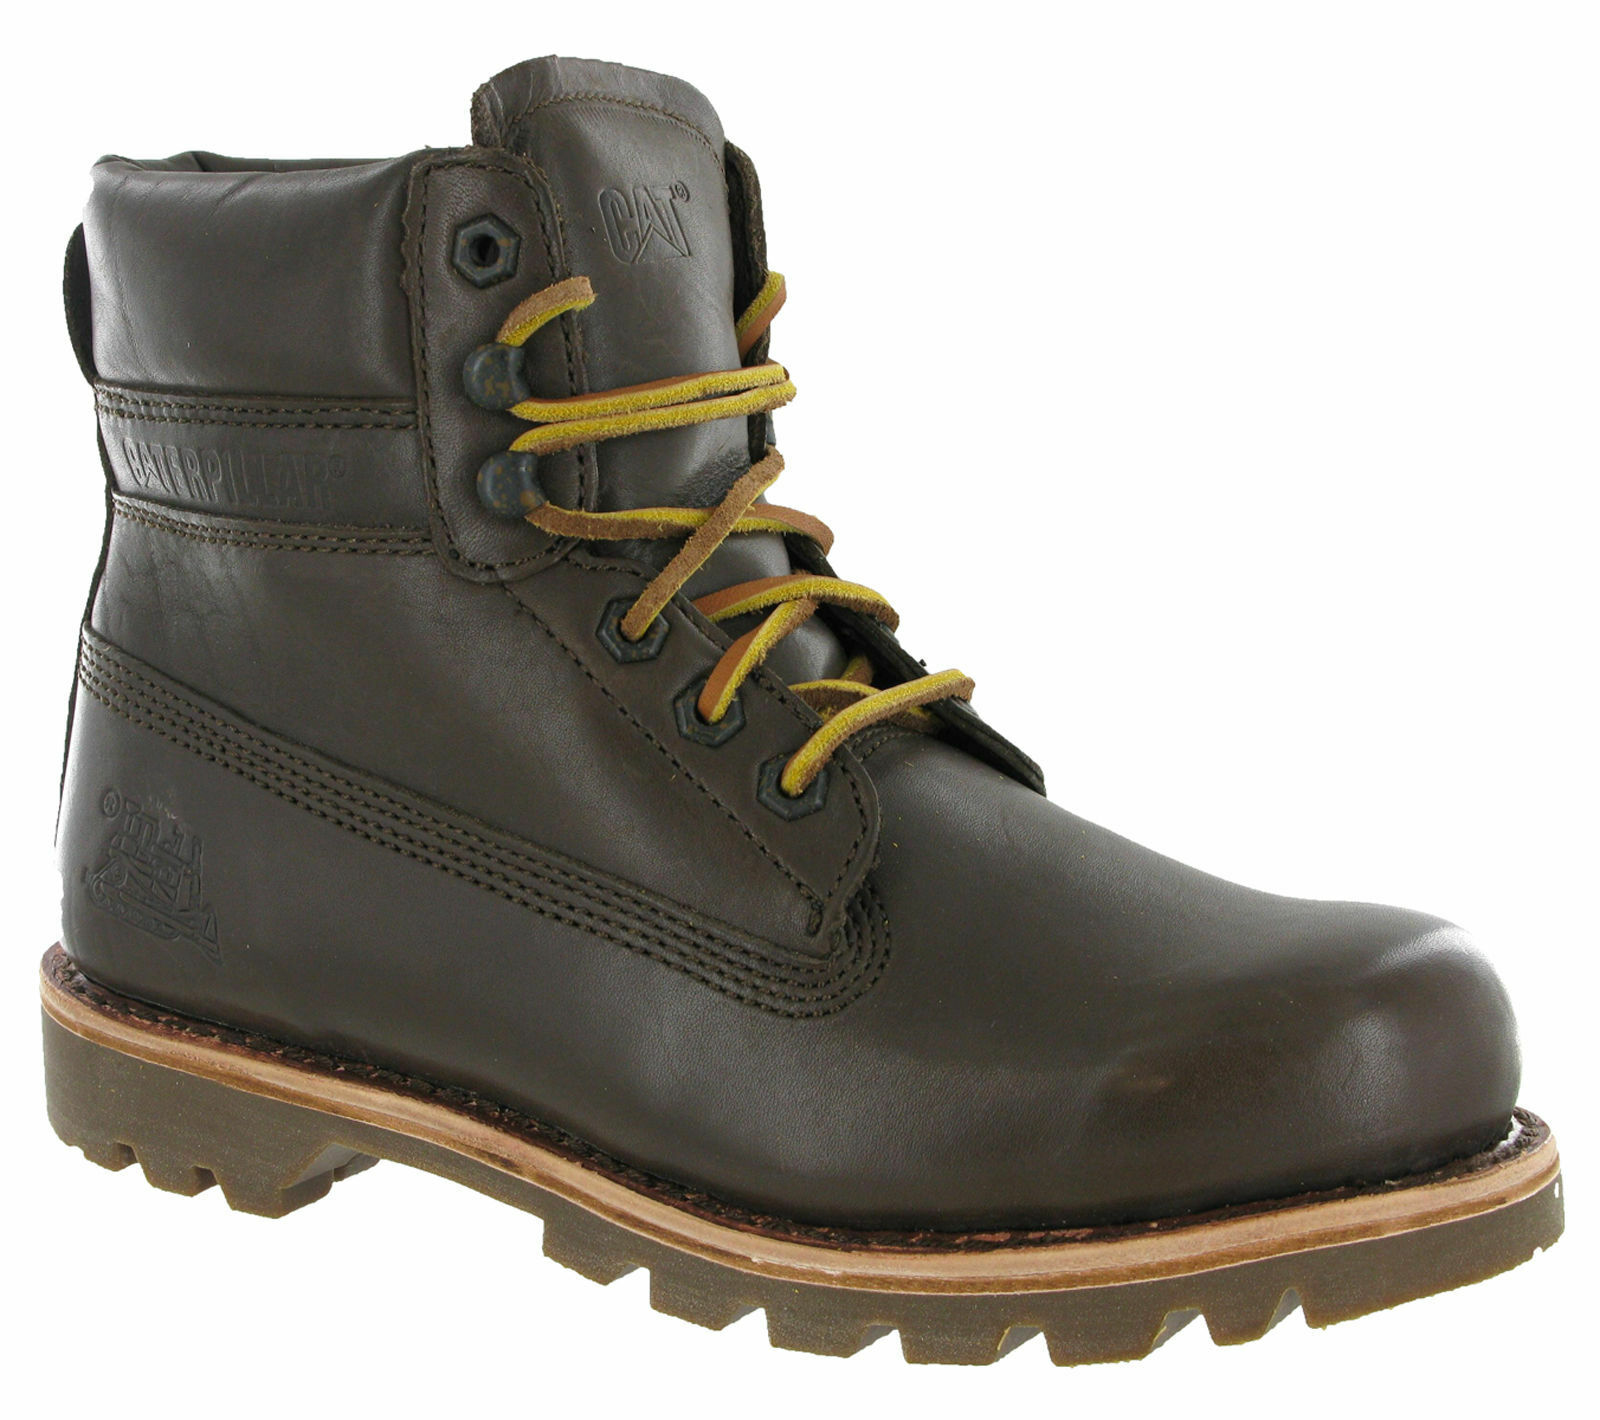 Caterpillar colorado Boots mudrick Leather, Low Wide Lace Cat Man